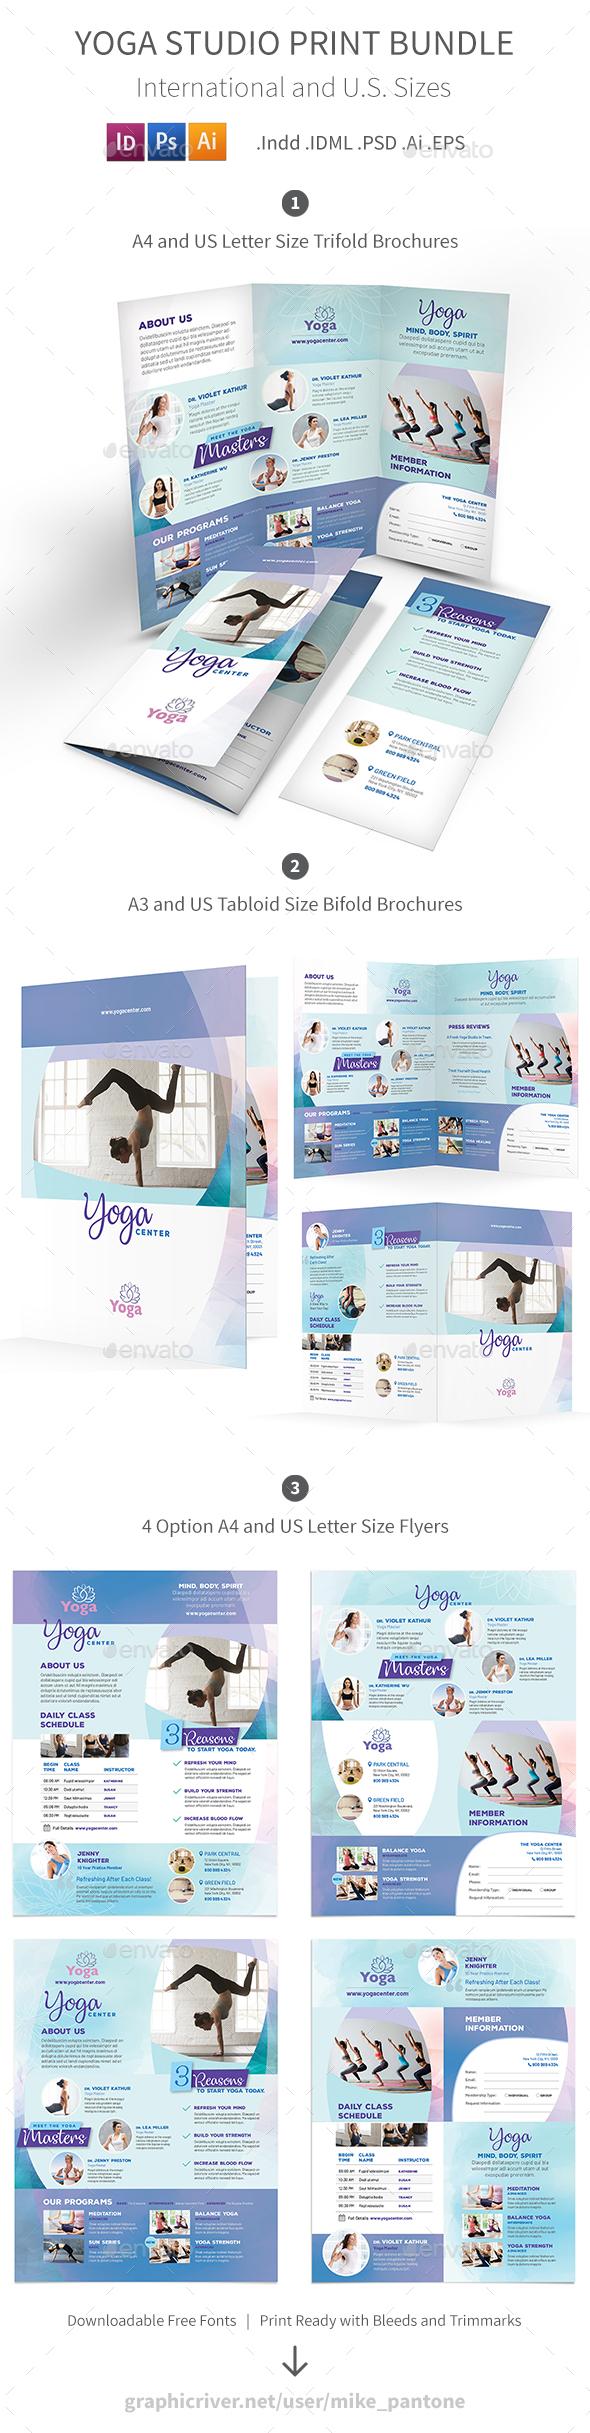 Yoga Studio Print Bundle 3 - Informational Brochures